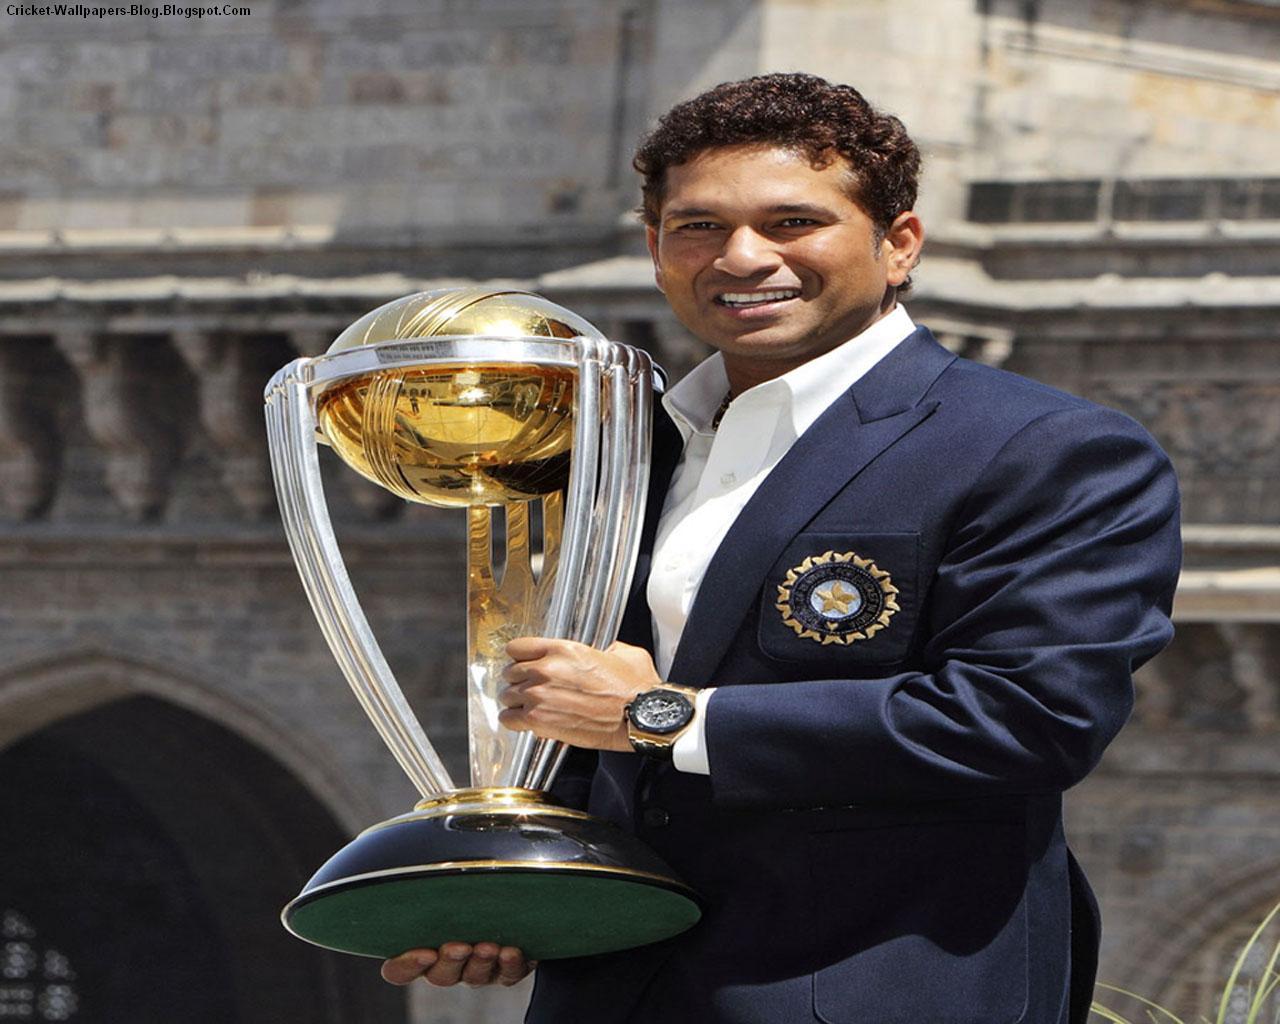 Cricket Wallpapers Sachin Tendulkar With World Cup Wallpapers